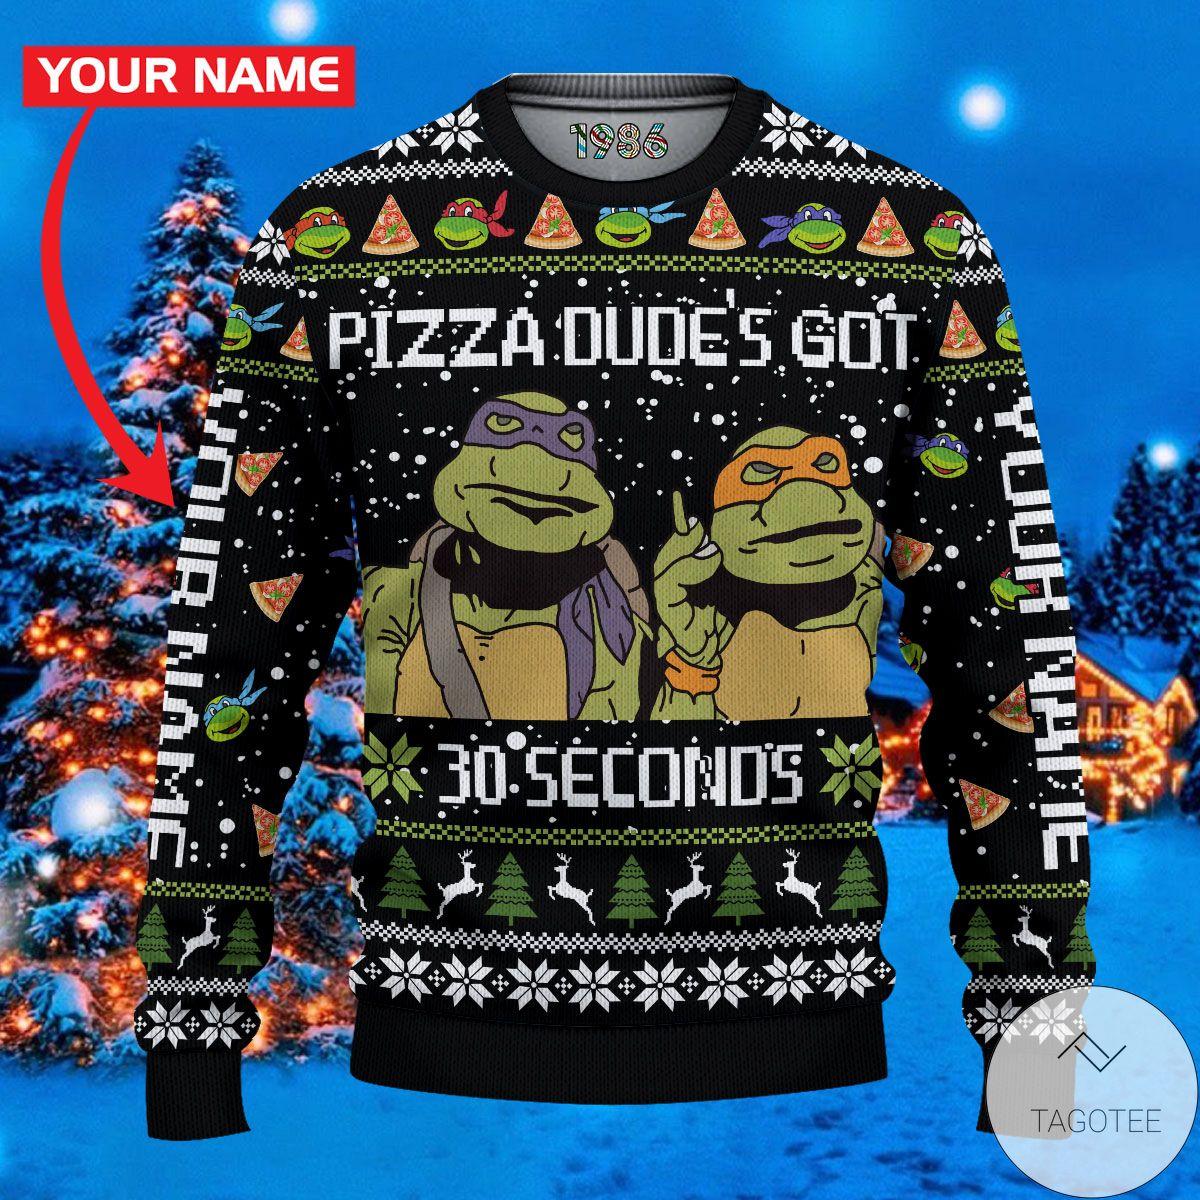 Pizza Dude's Got 30 Seconds Teenage Mutant Ninja Turtles Ugly Christmas Sweater